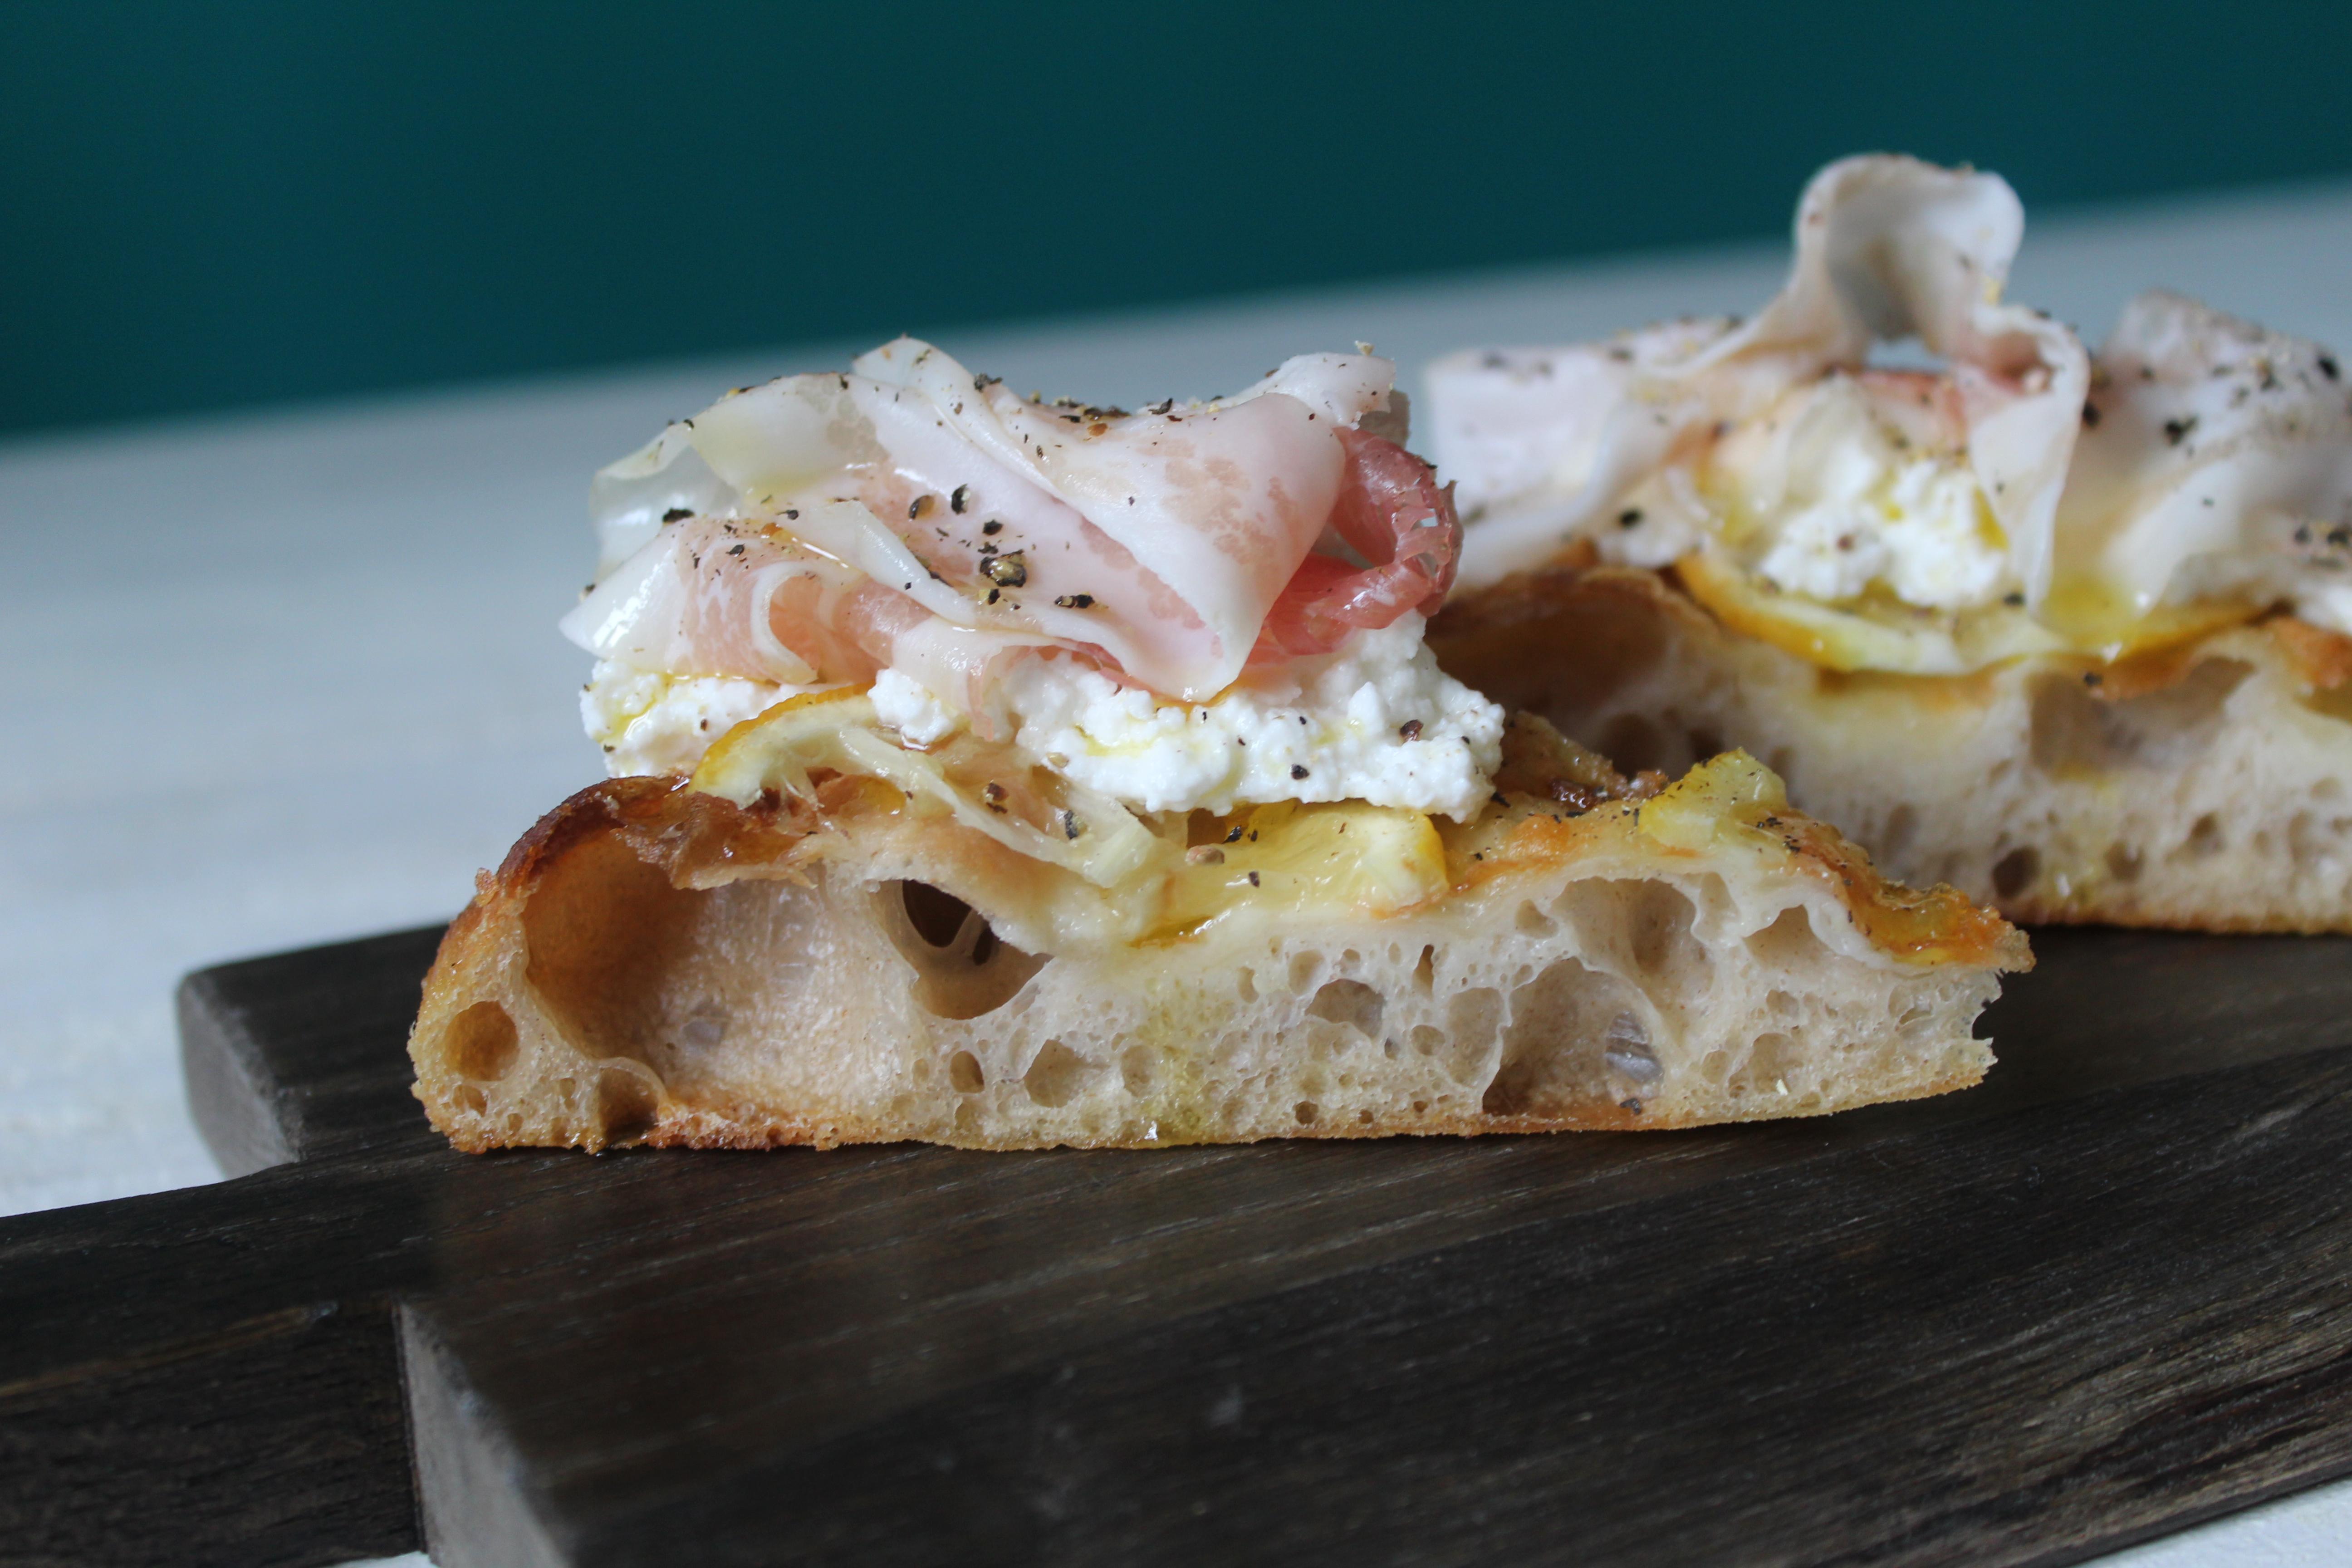 Pizza ricotta pancetta e limone